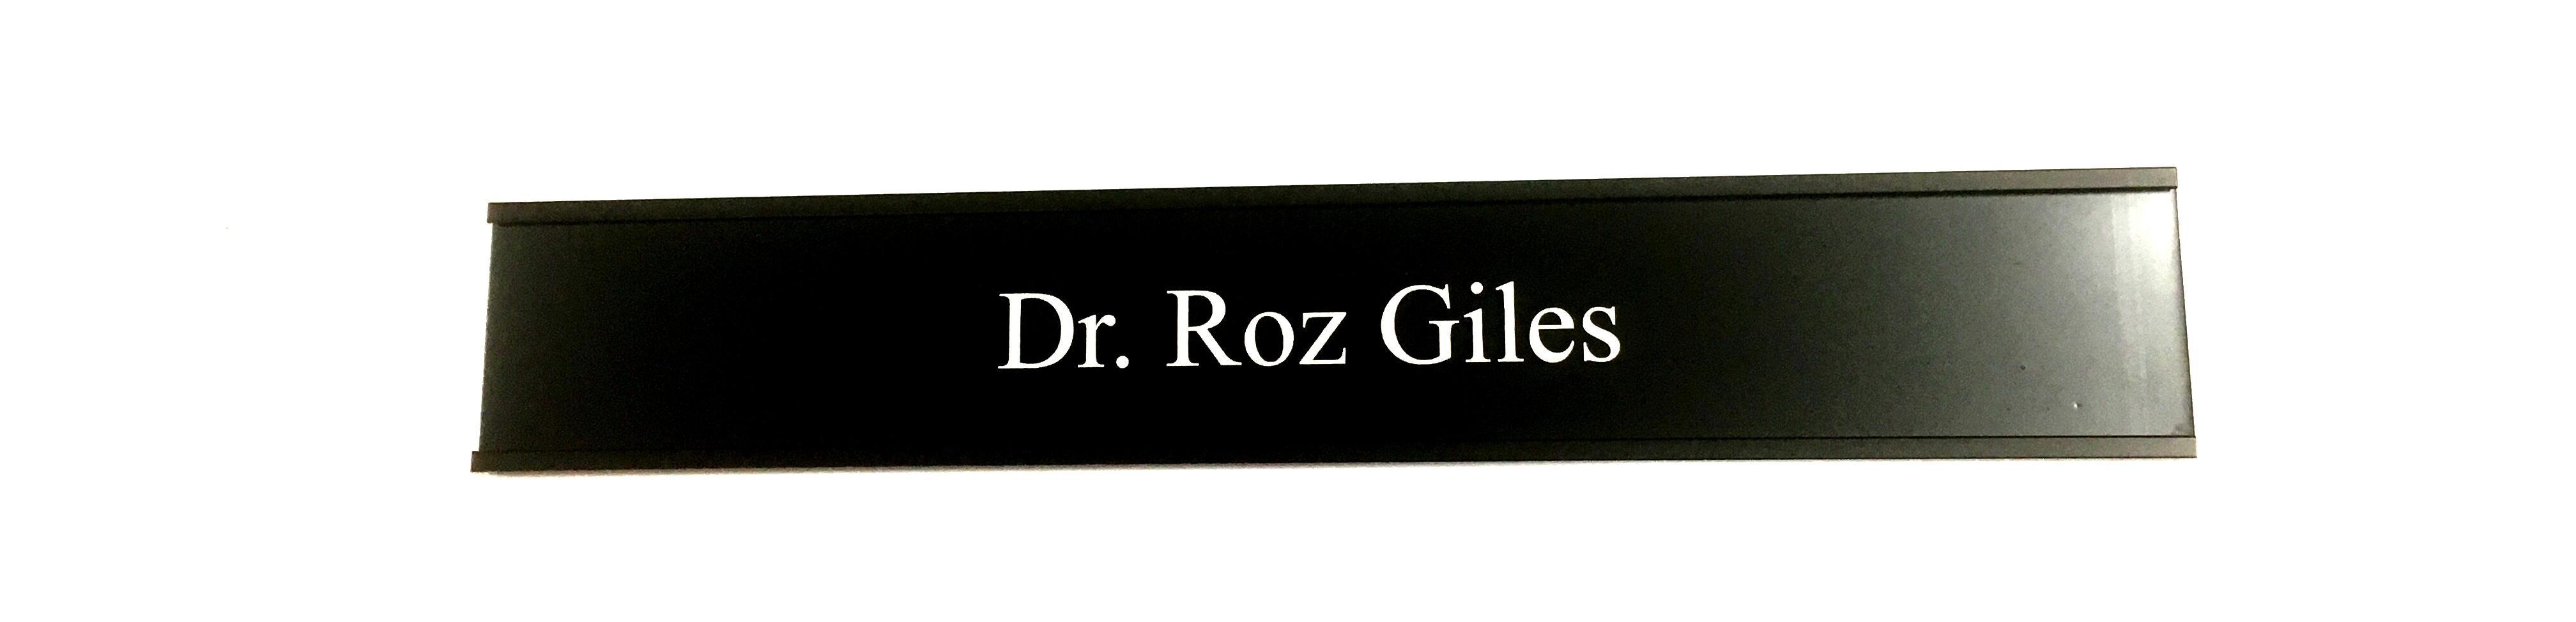 Black Door Name Plate & Extrusion 250mm x 38mm